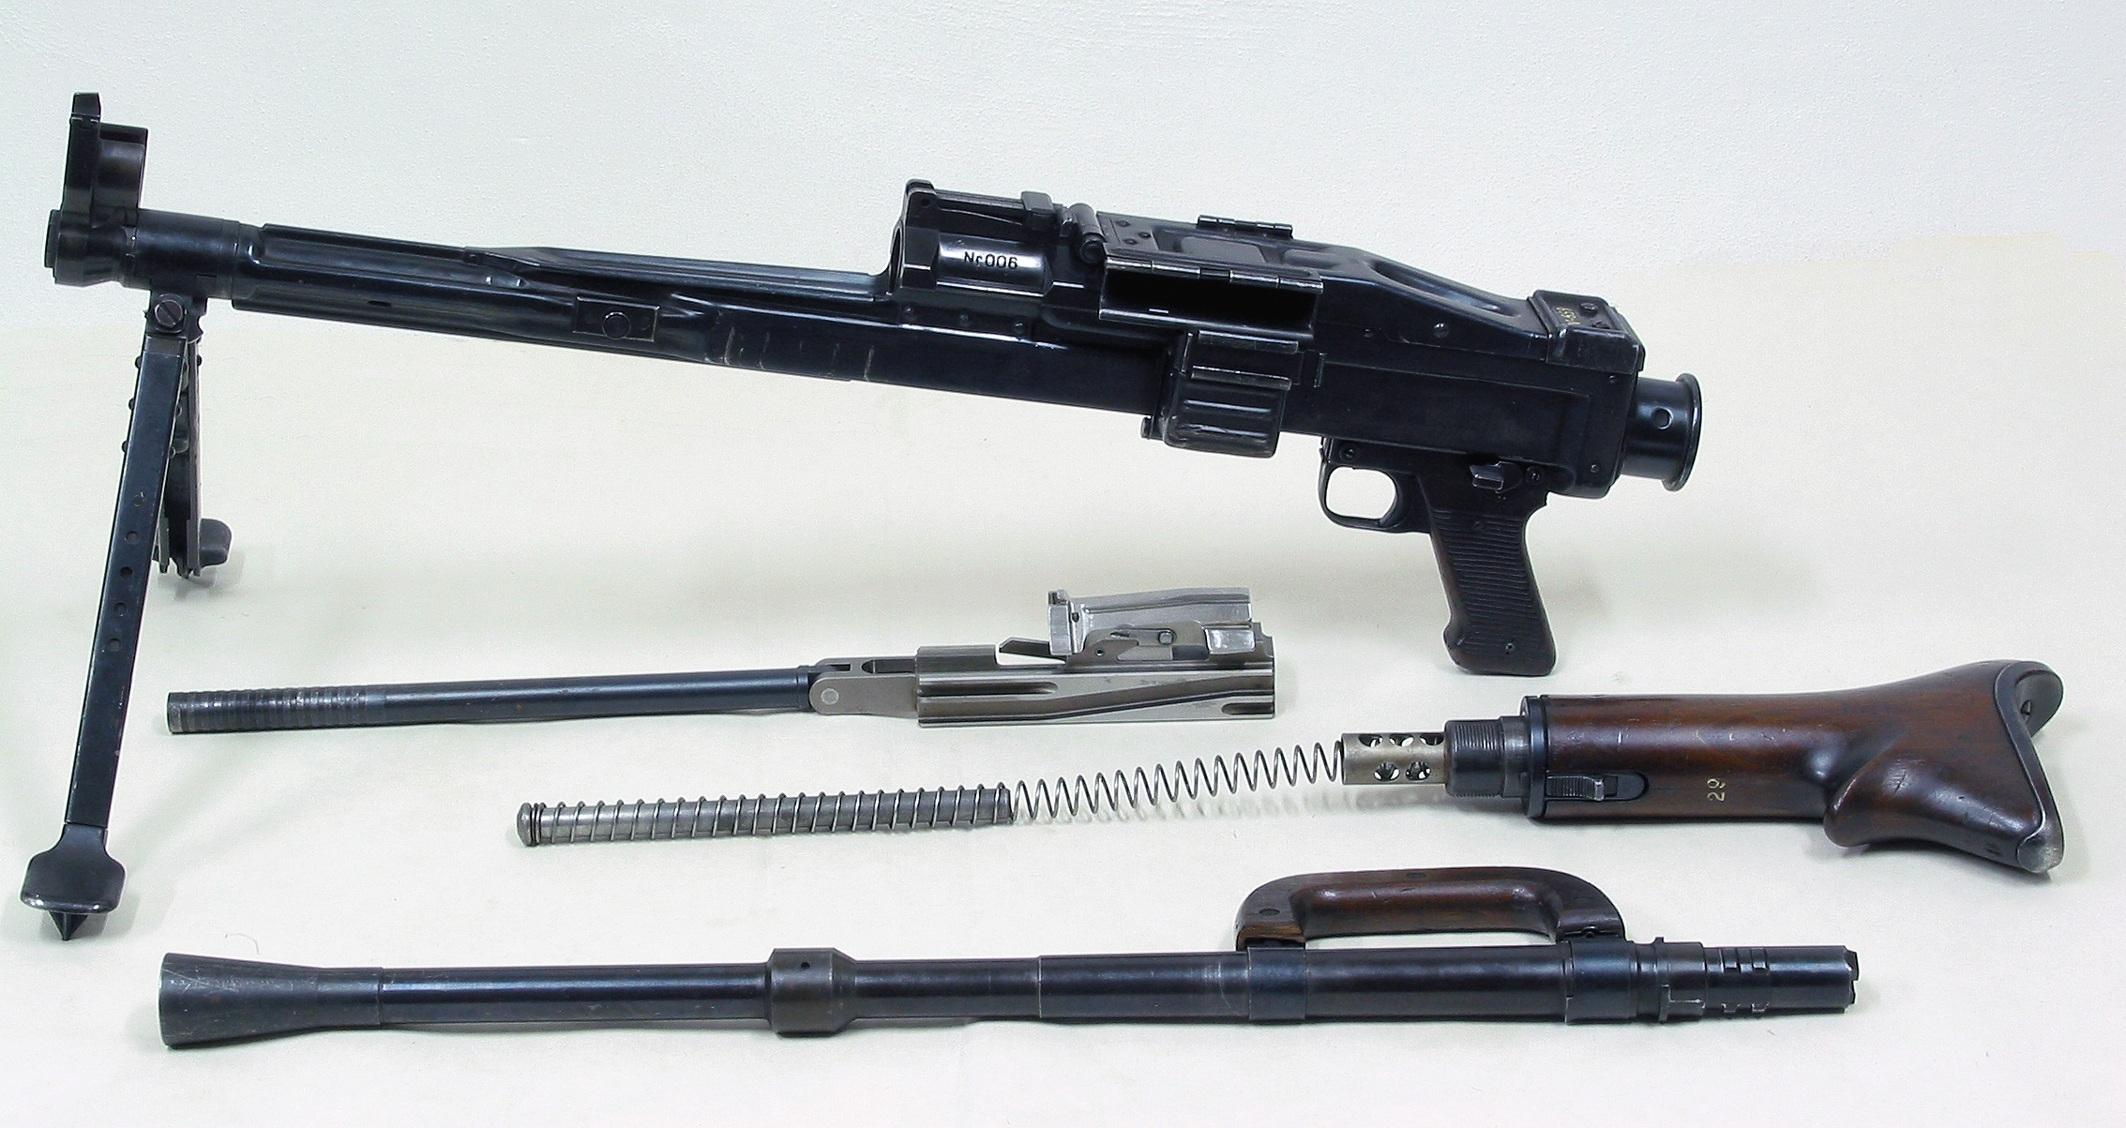 MG 39 Rh – Forgotten Weapons